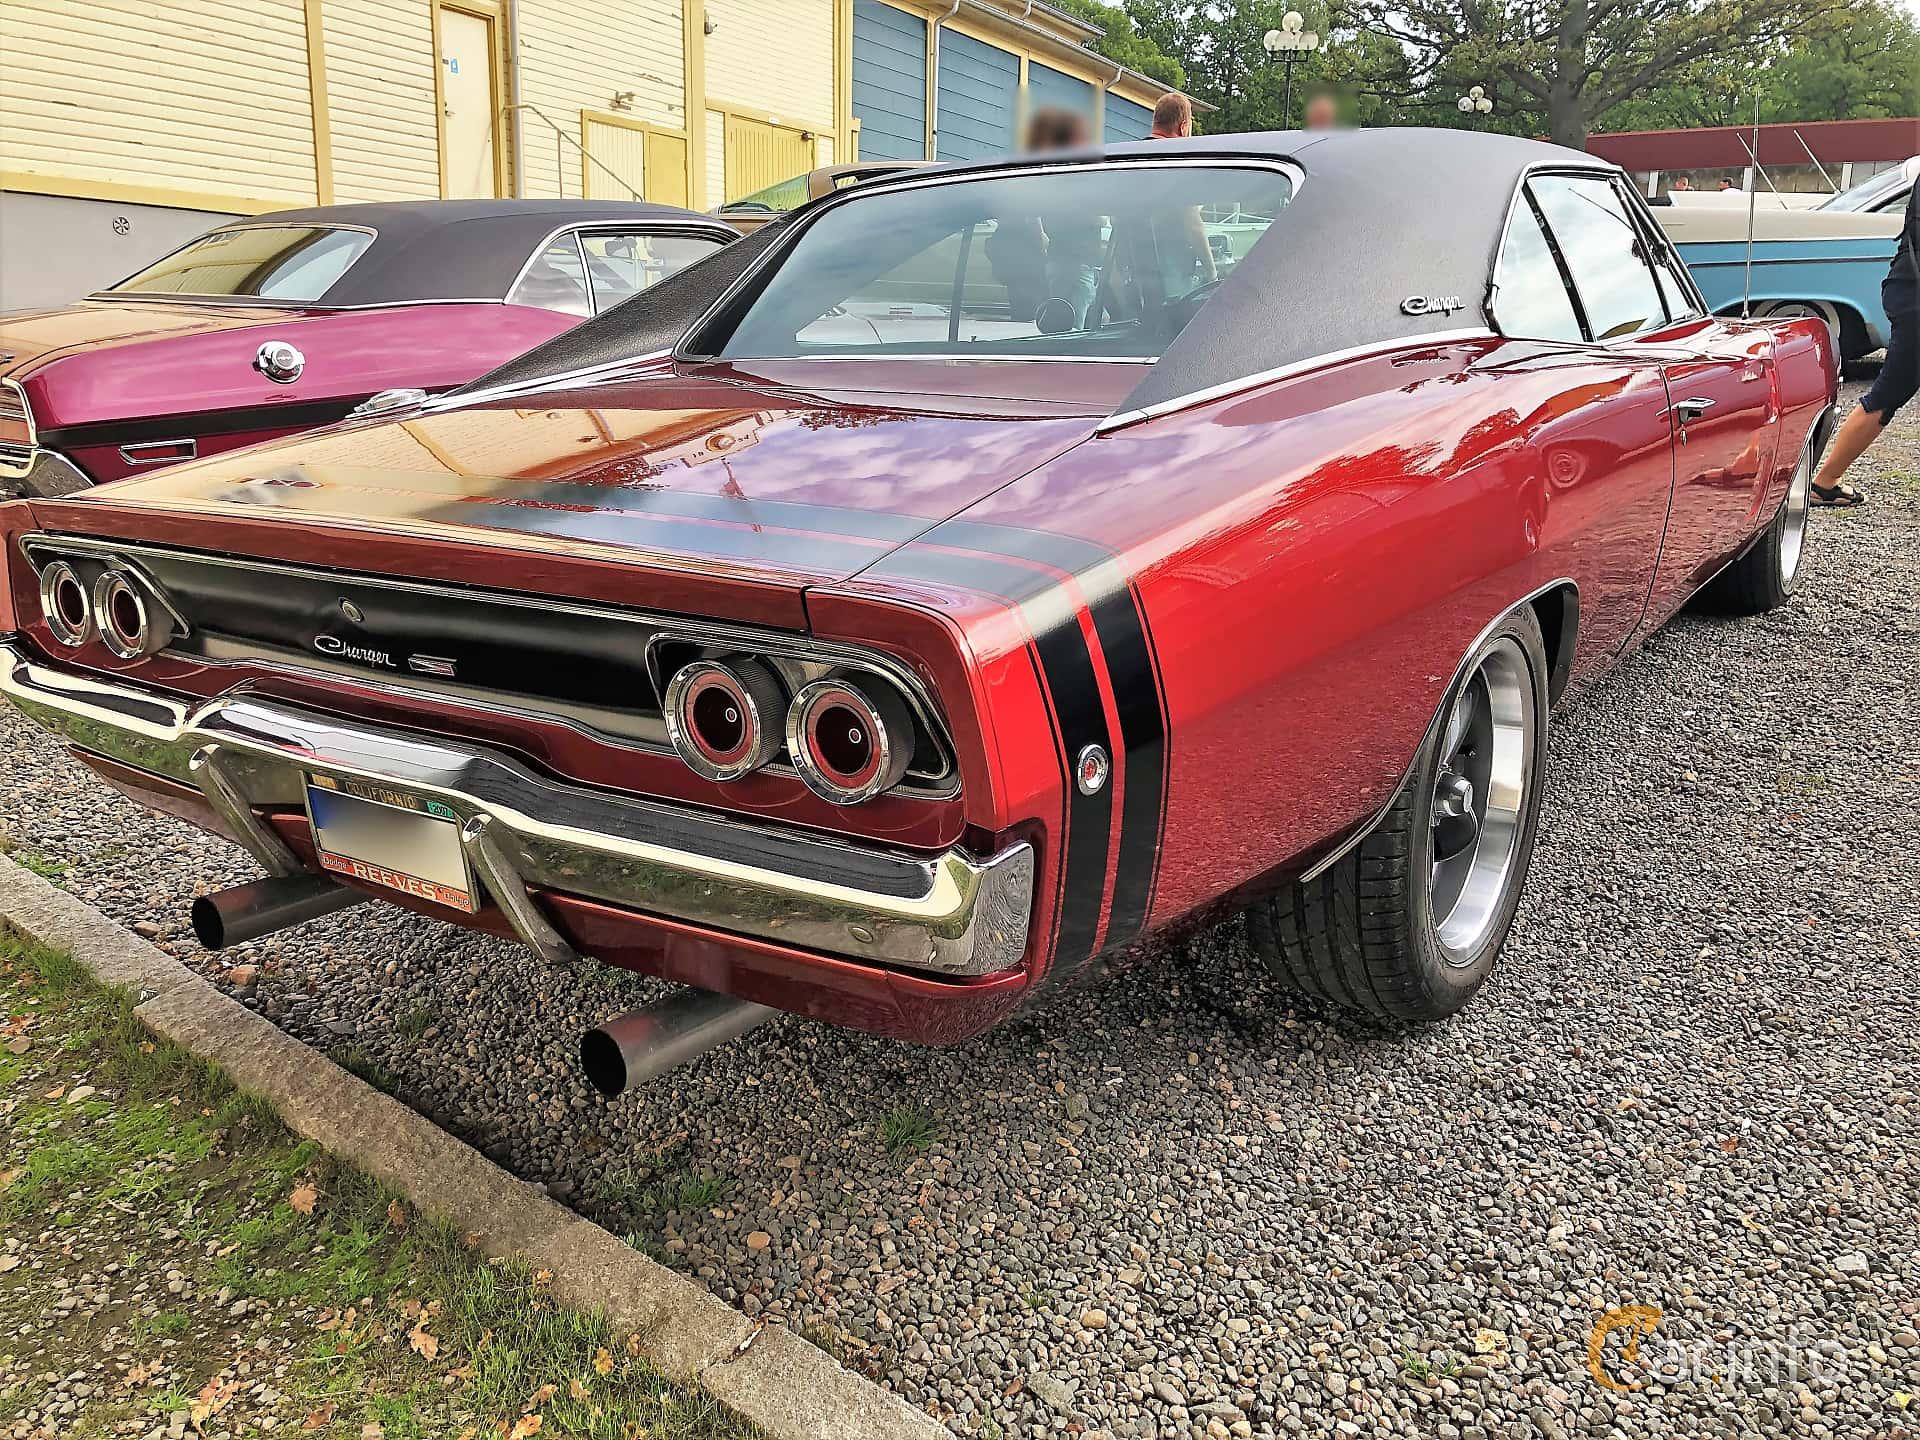 Back/Side of Dodge Charger 6.3 V8 TorqueFlite, 334ps, 1968 at Bil & MC-träffar i Huskvarna Folkets Park 2019 vecka 32 tema Hot Rods